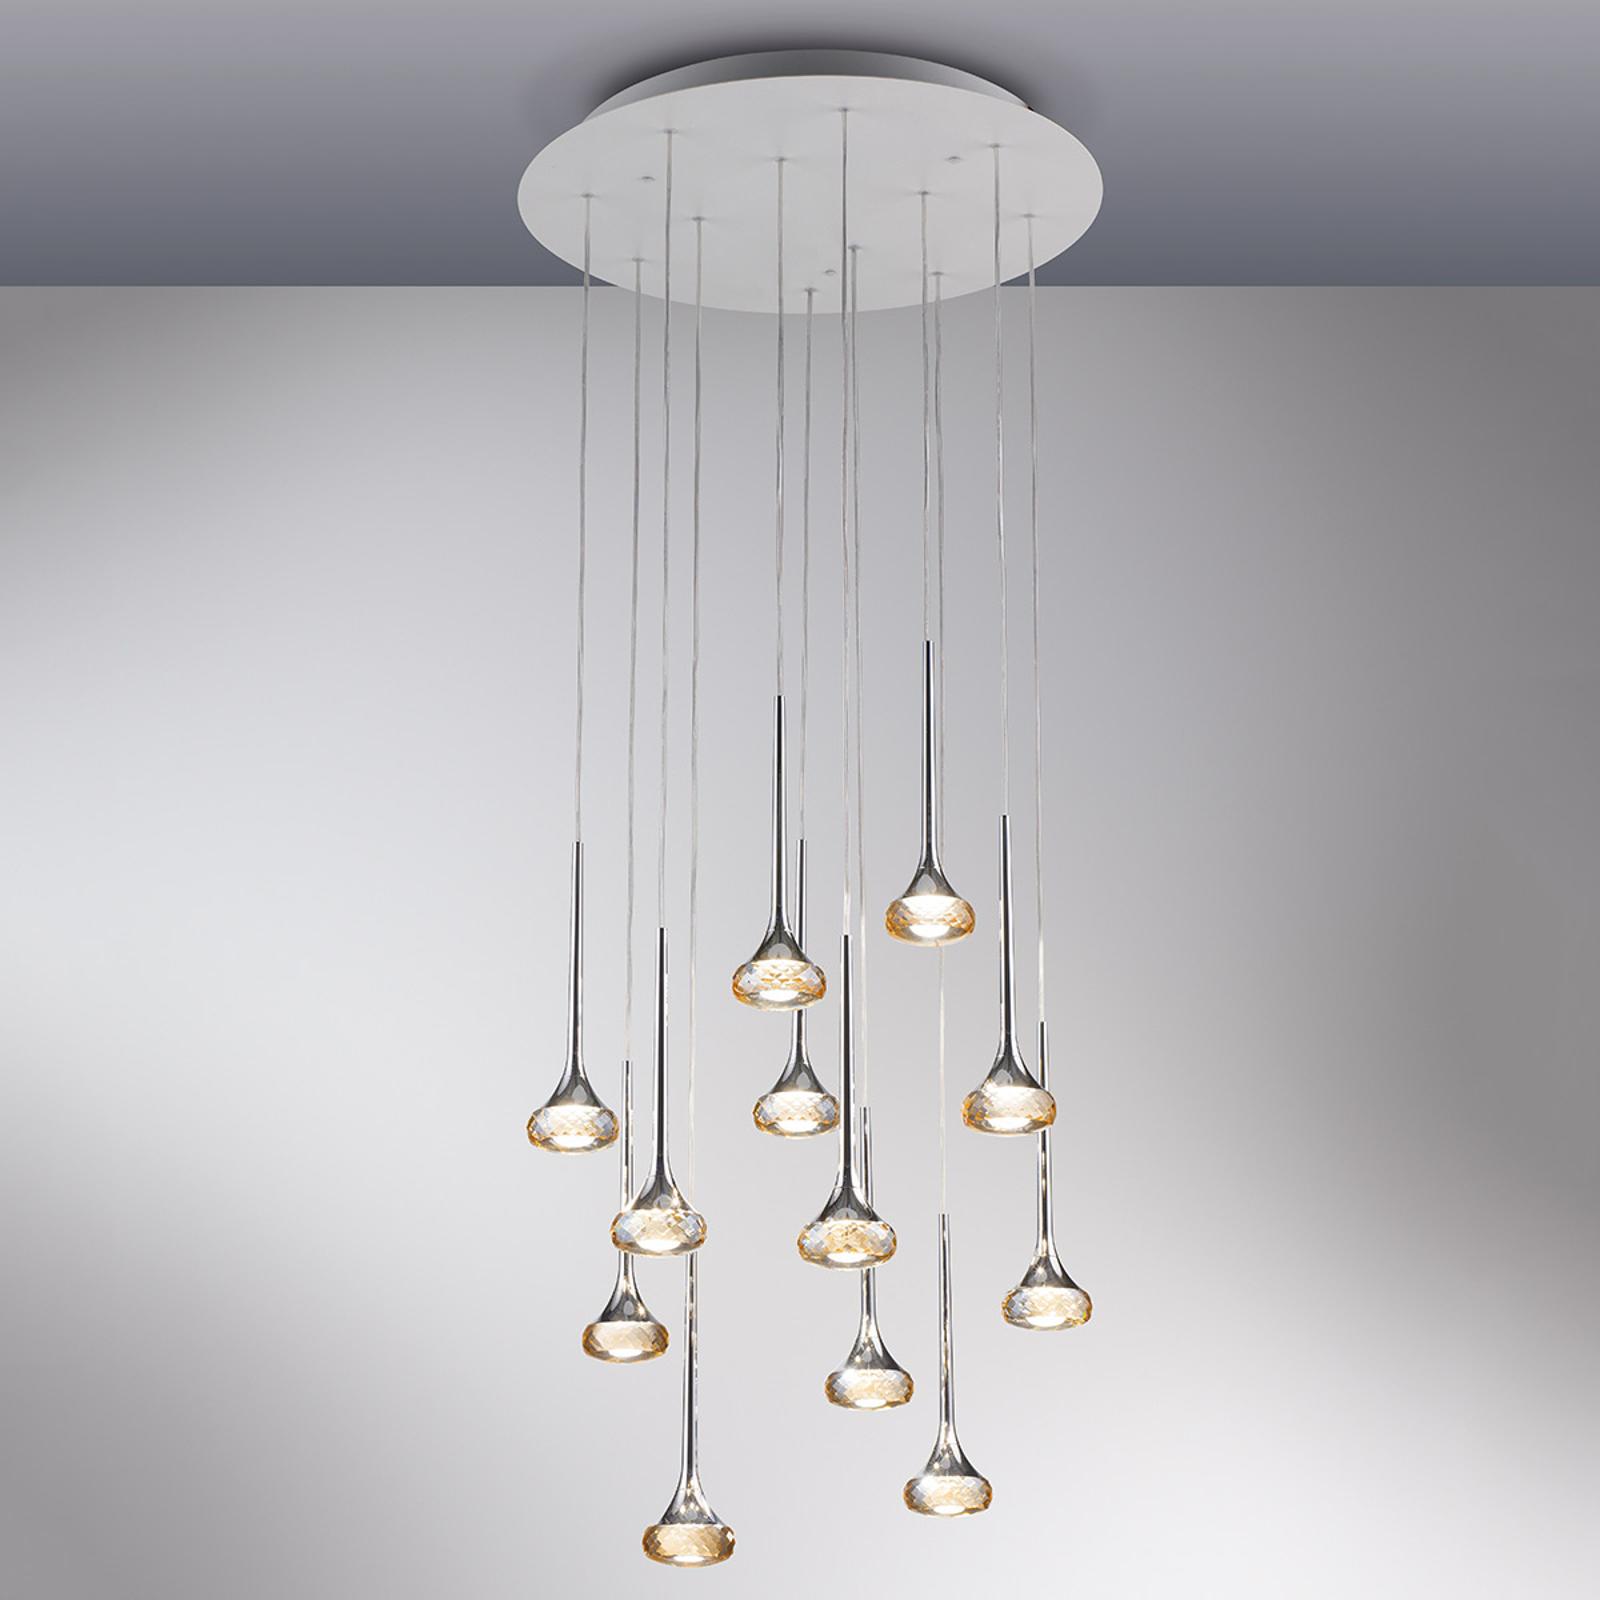 Dwupunktowa lampa wisząca LED FAIRY, bursztyn.